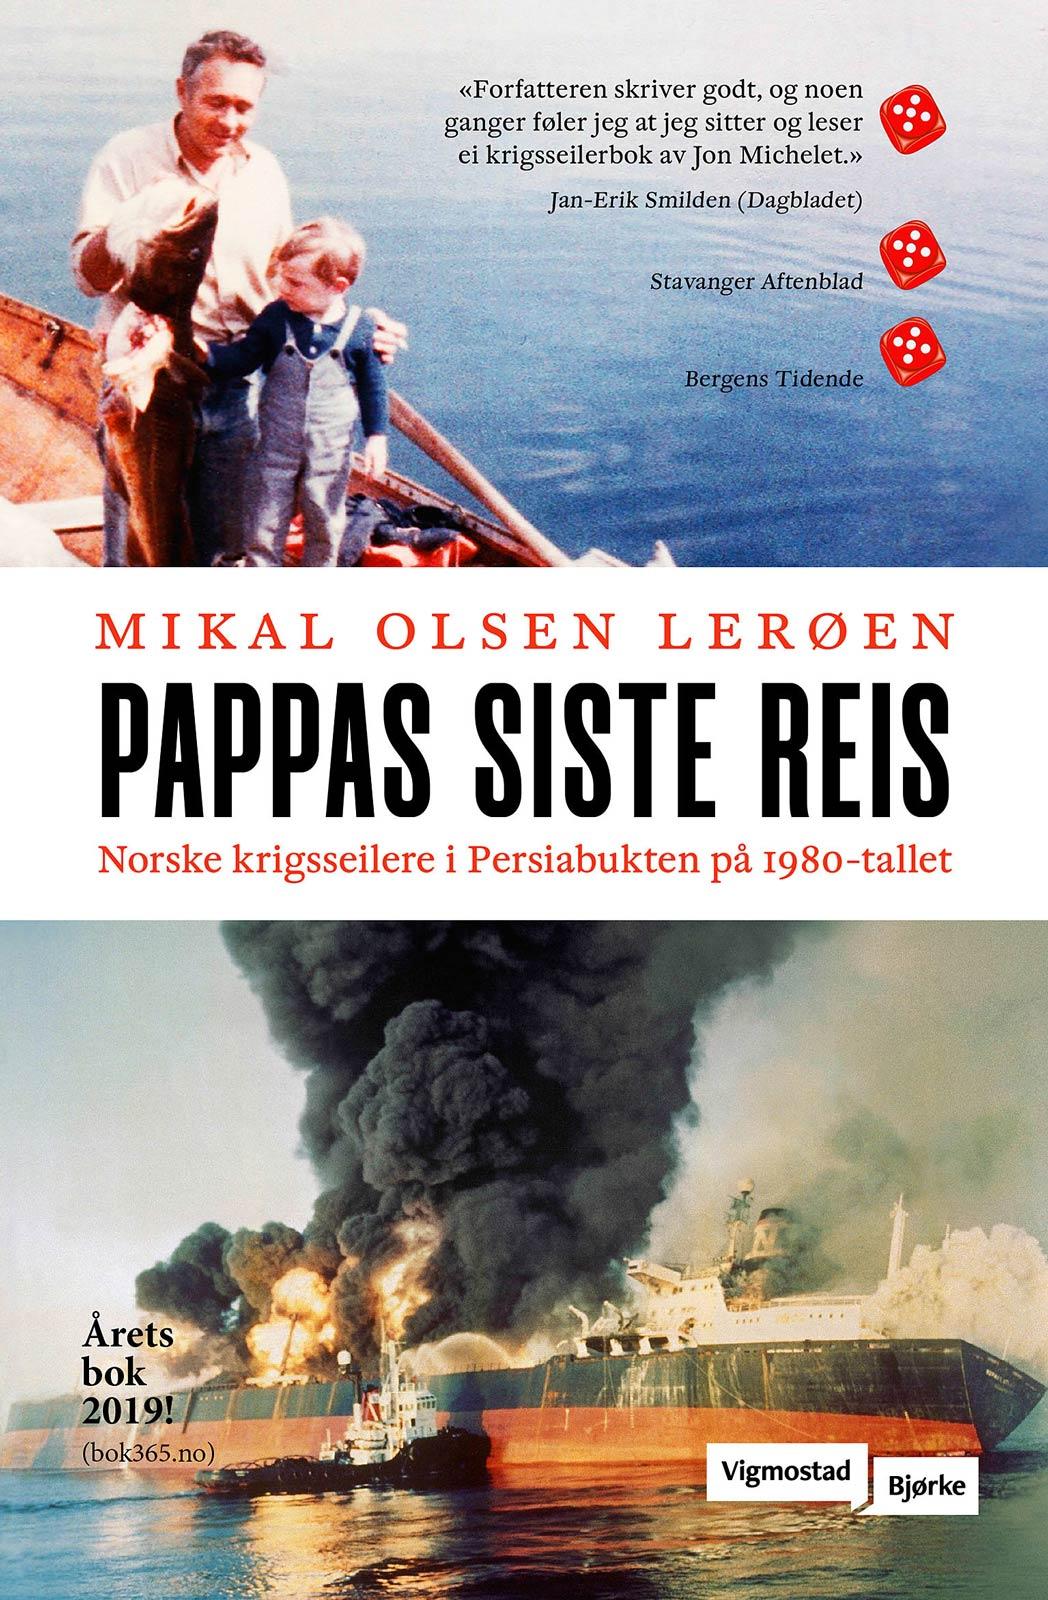 Bokomslaget til Pappas siste reis